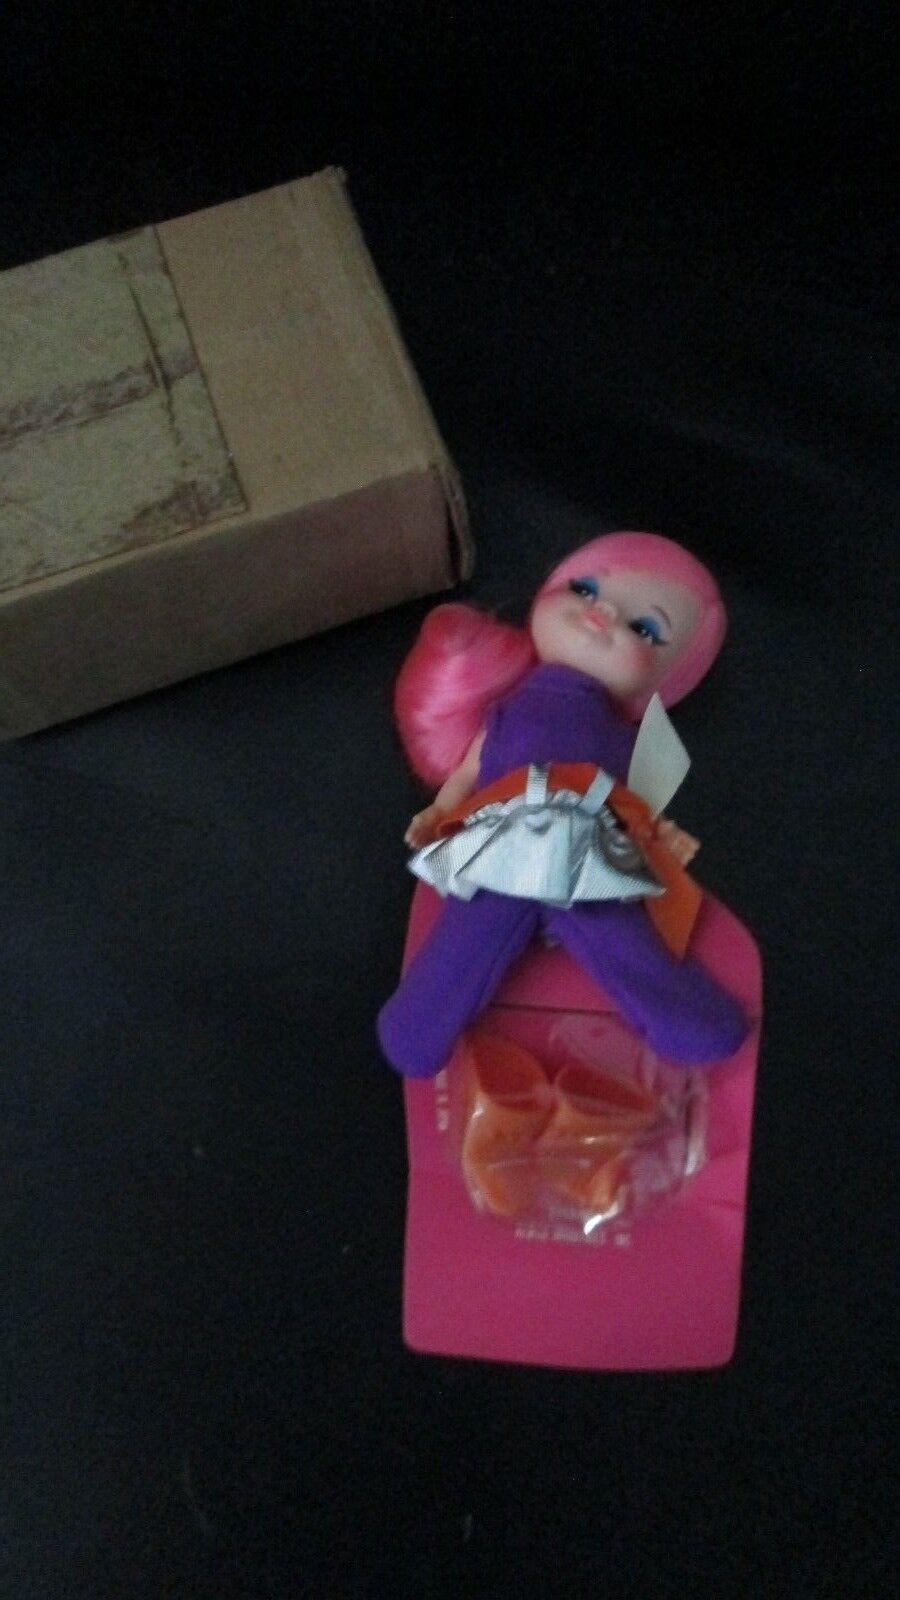 Nueva Muñeca Vintage 1969 dedo Ding Millie Mod Remco marioneta Go Go Girl